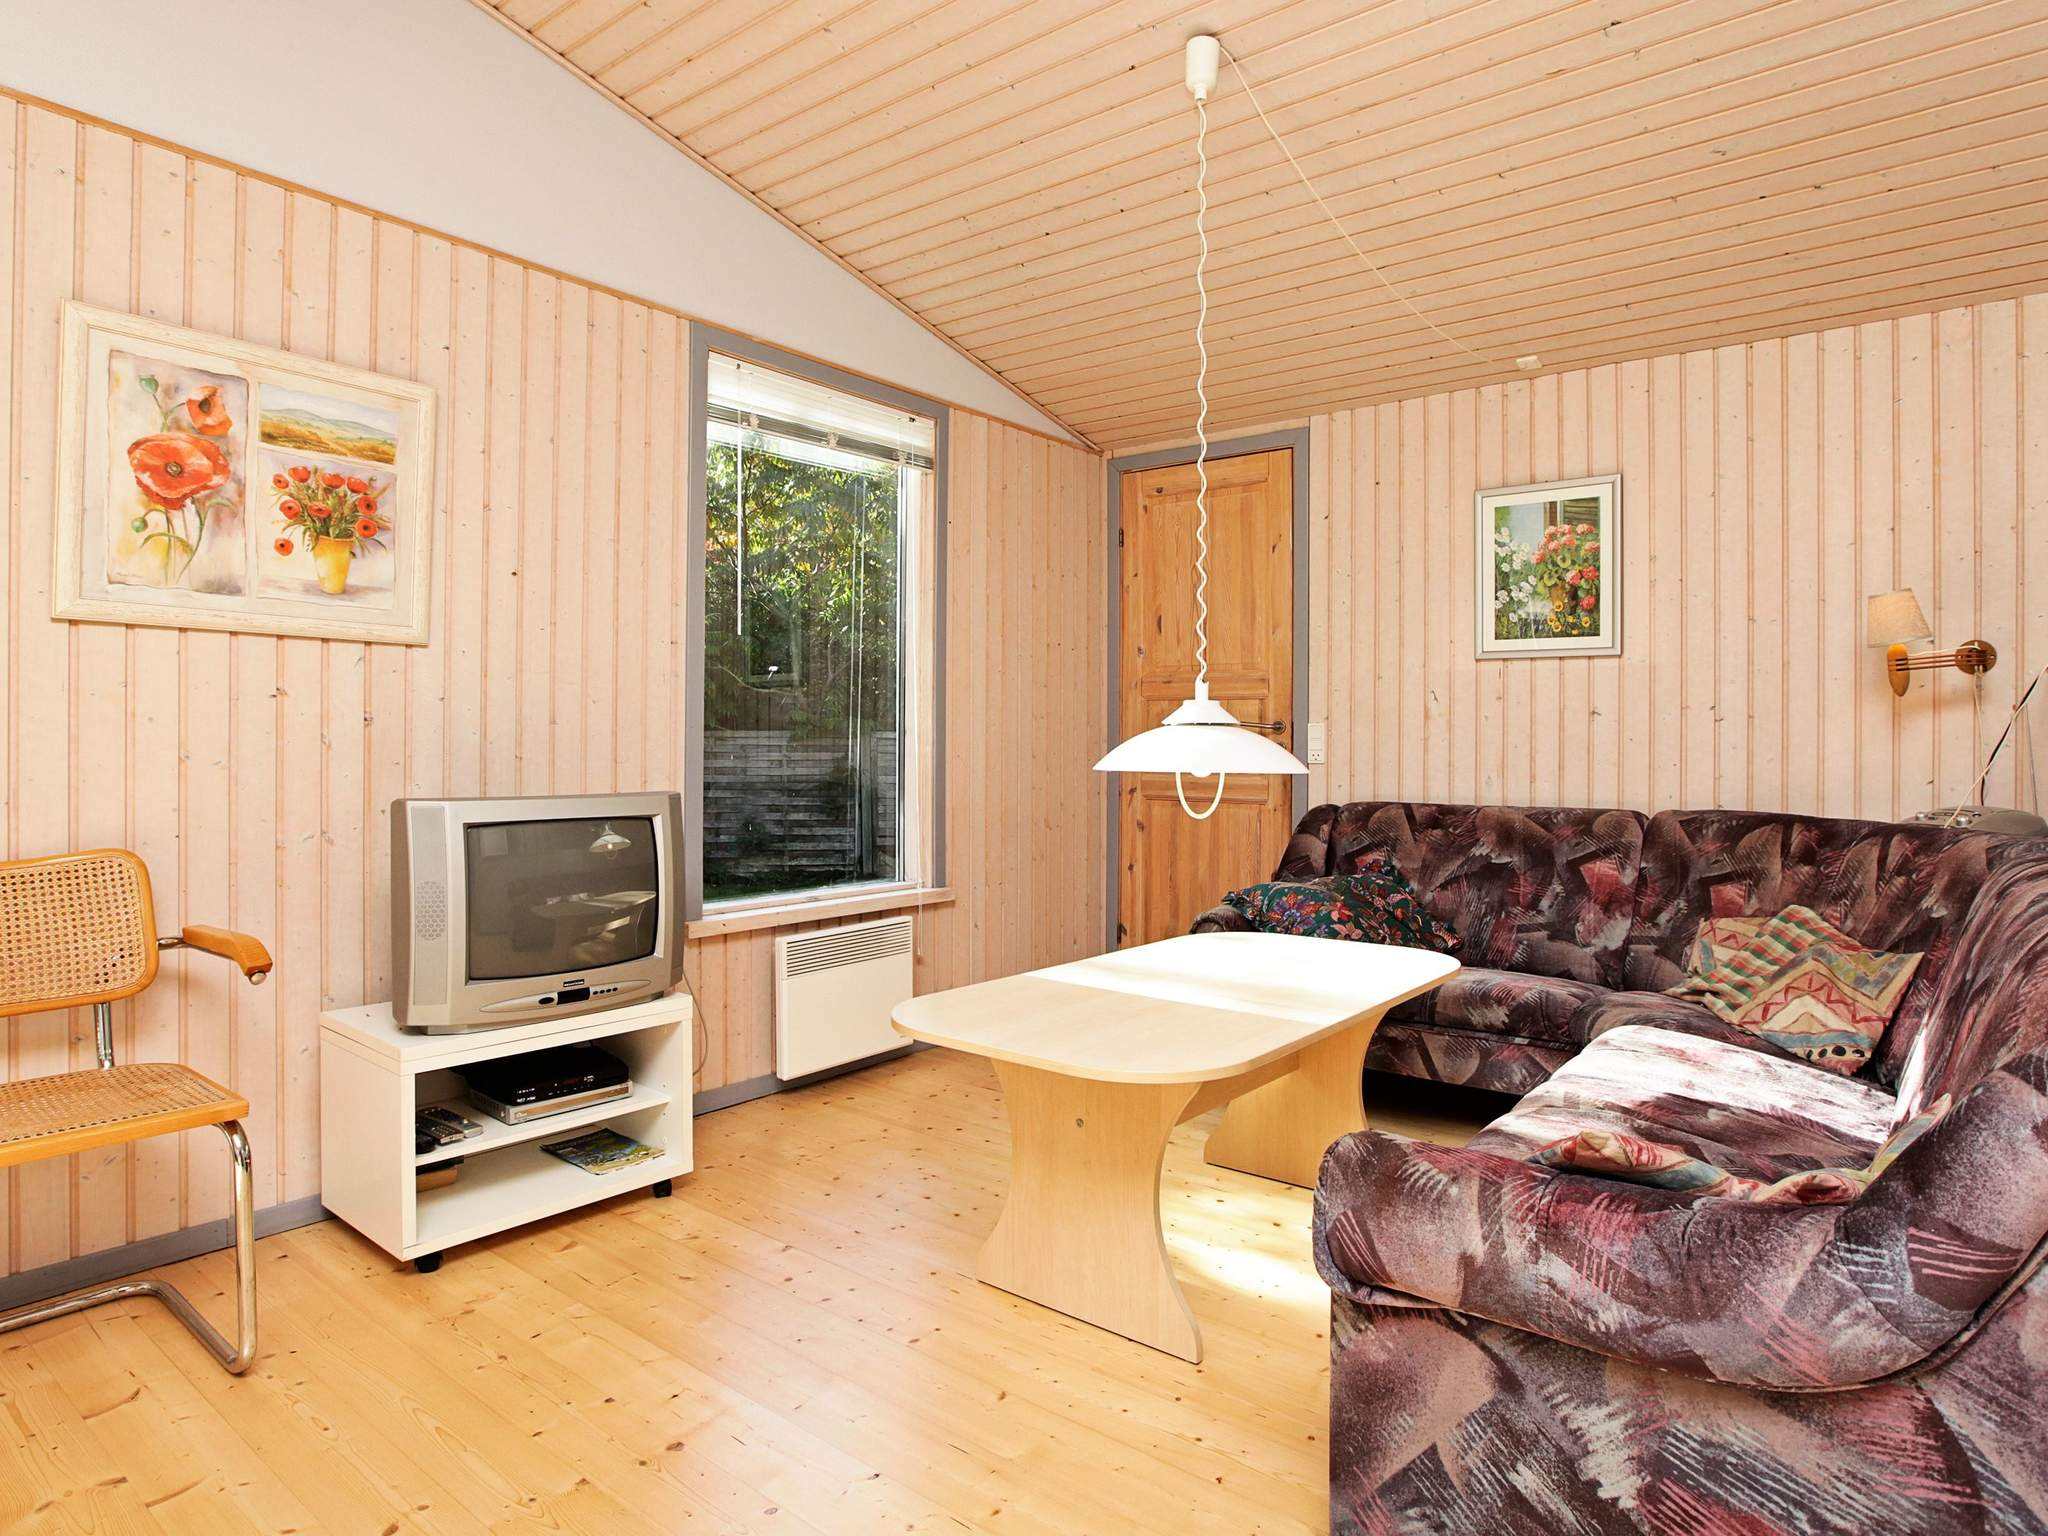 Ferienhaus Overby Lyng (93506), Nykøbing Sj, , Westseeland, Dänemark, Bild 10